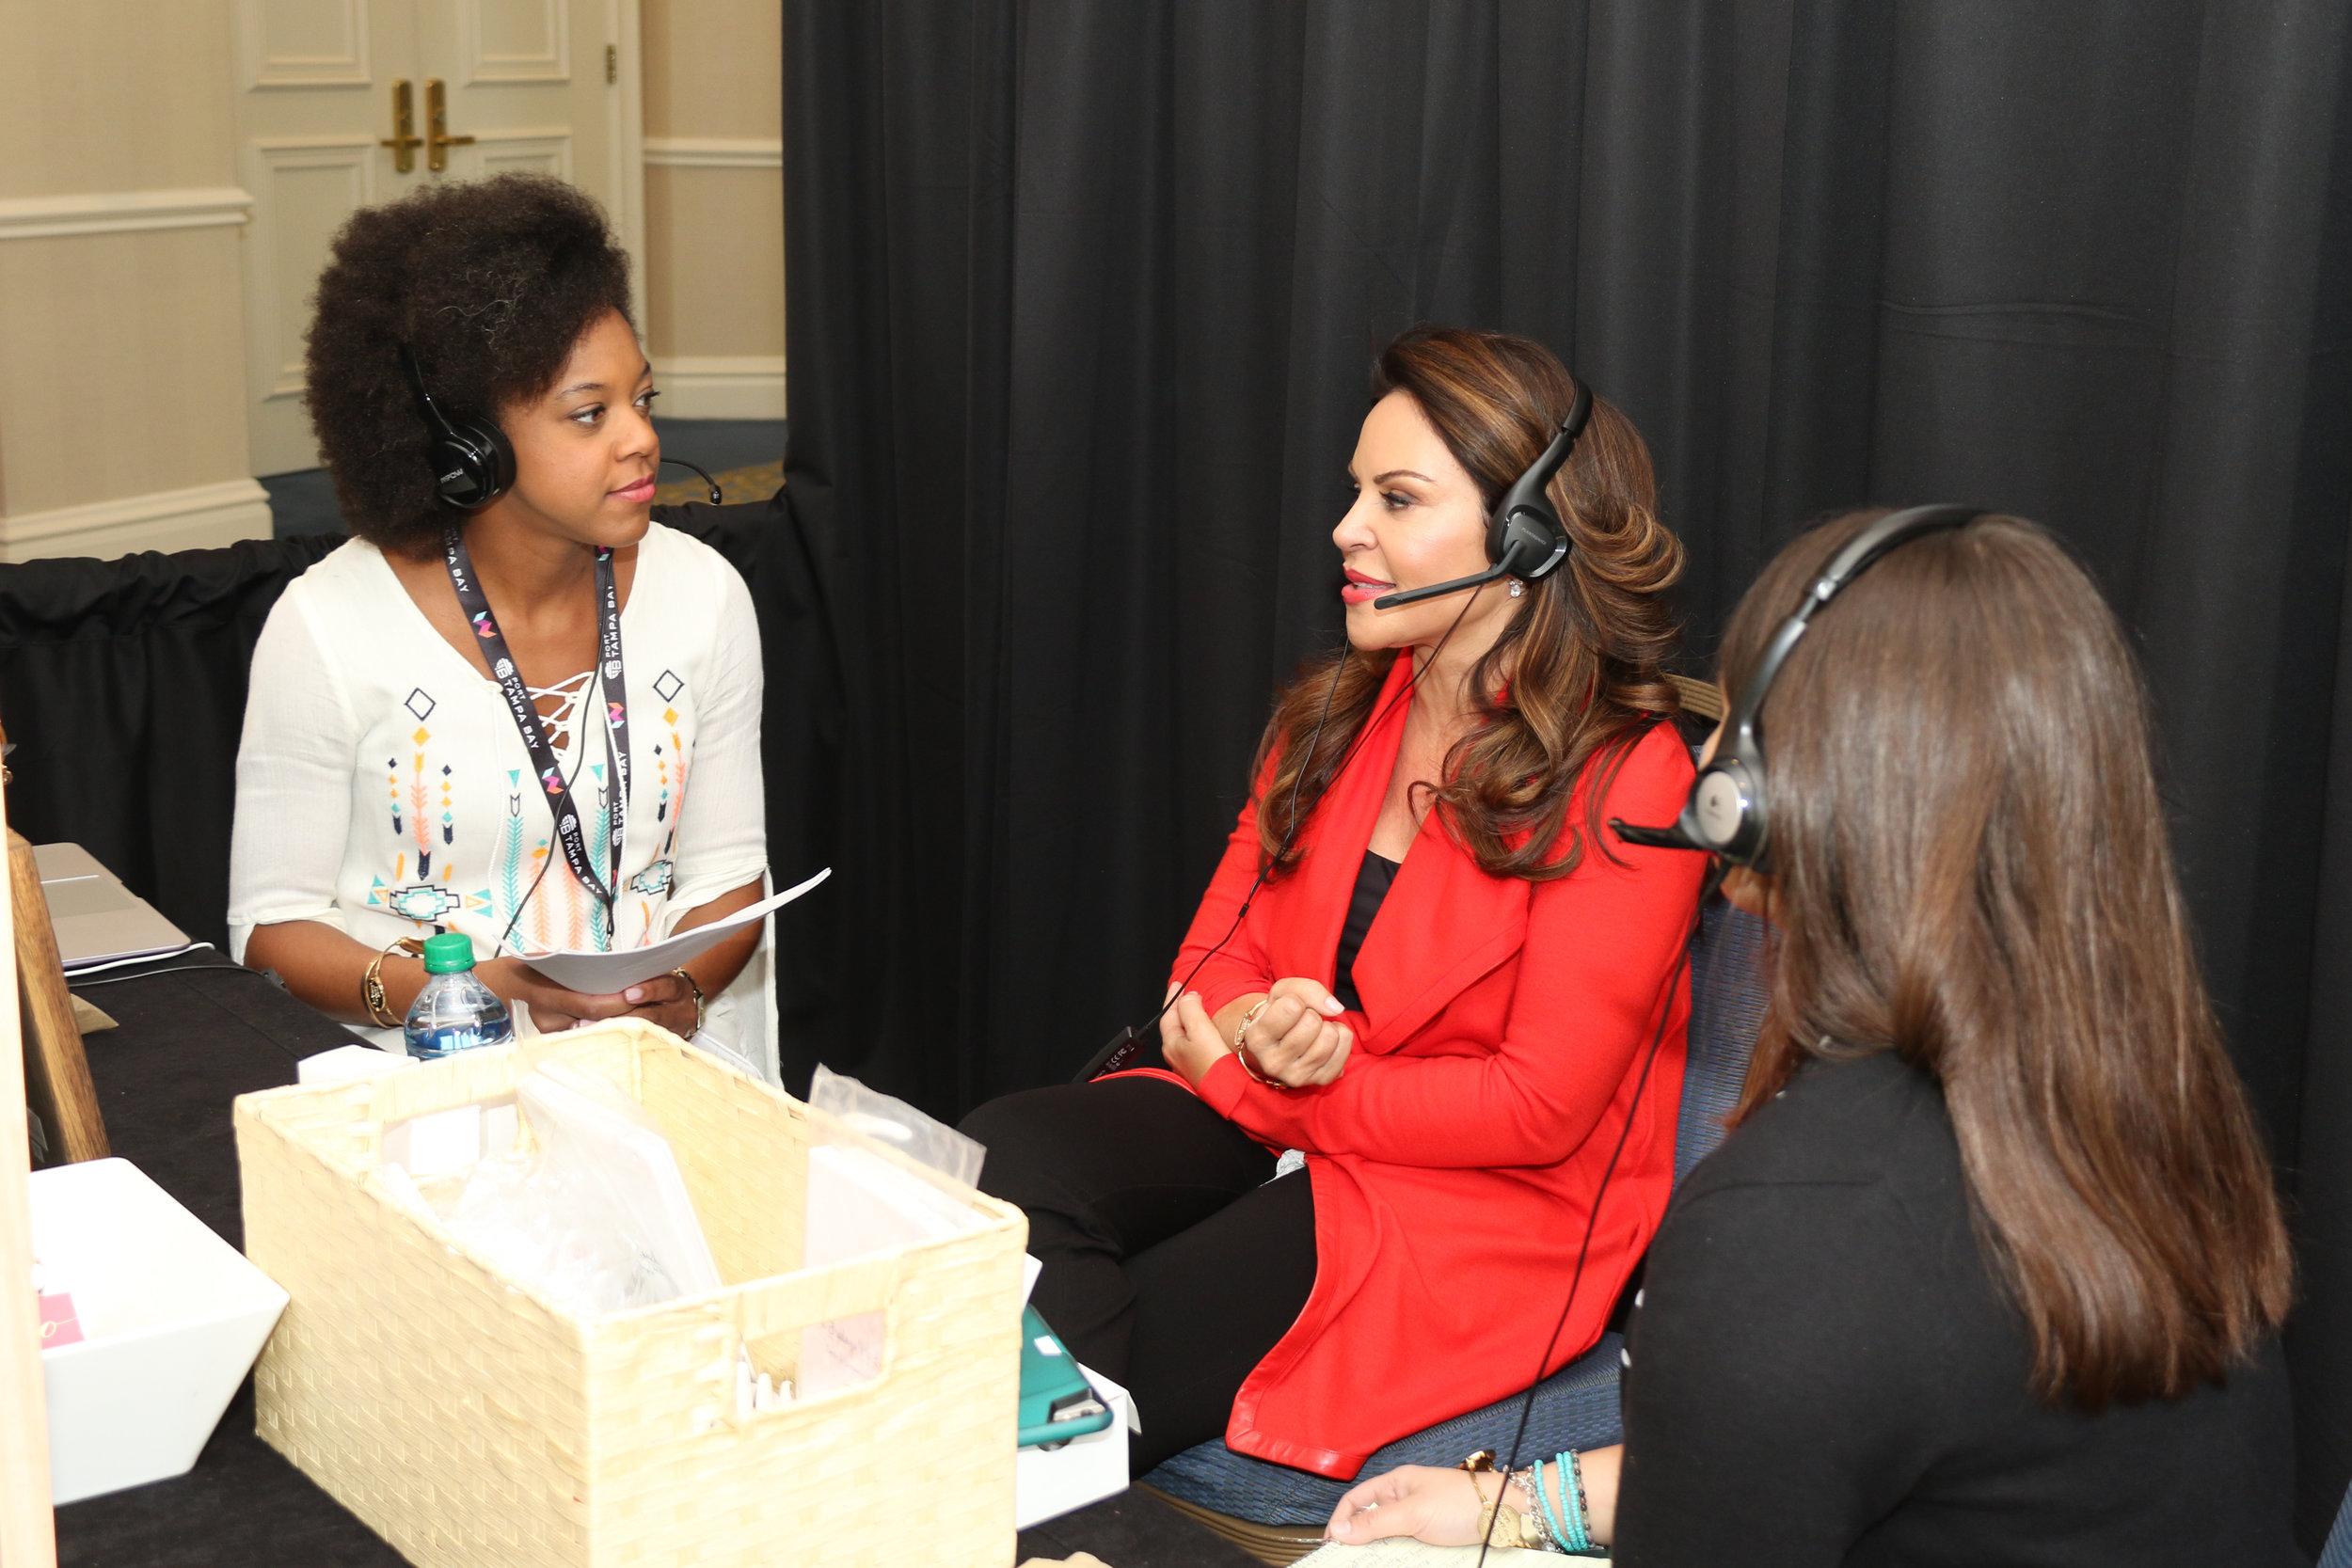 145_WomensConference_10-26-17.jpg